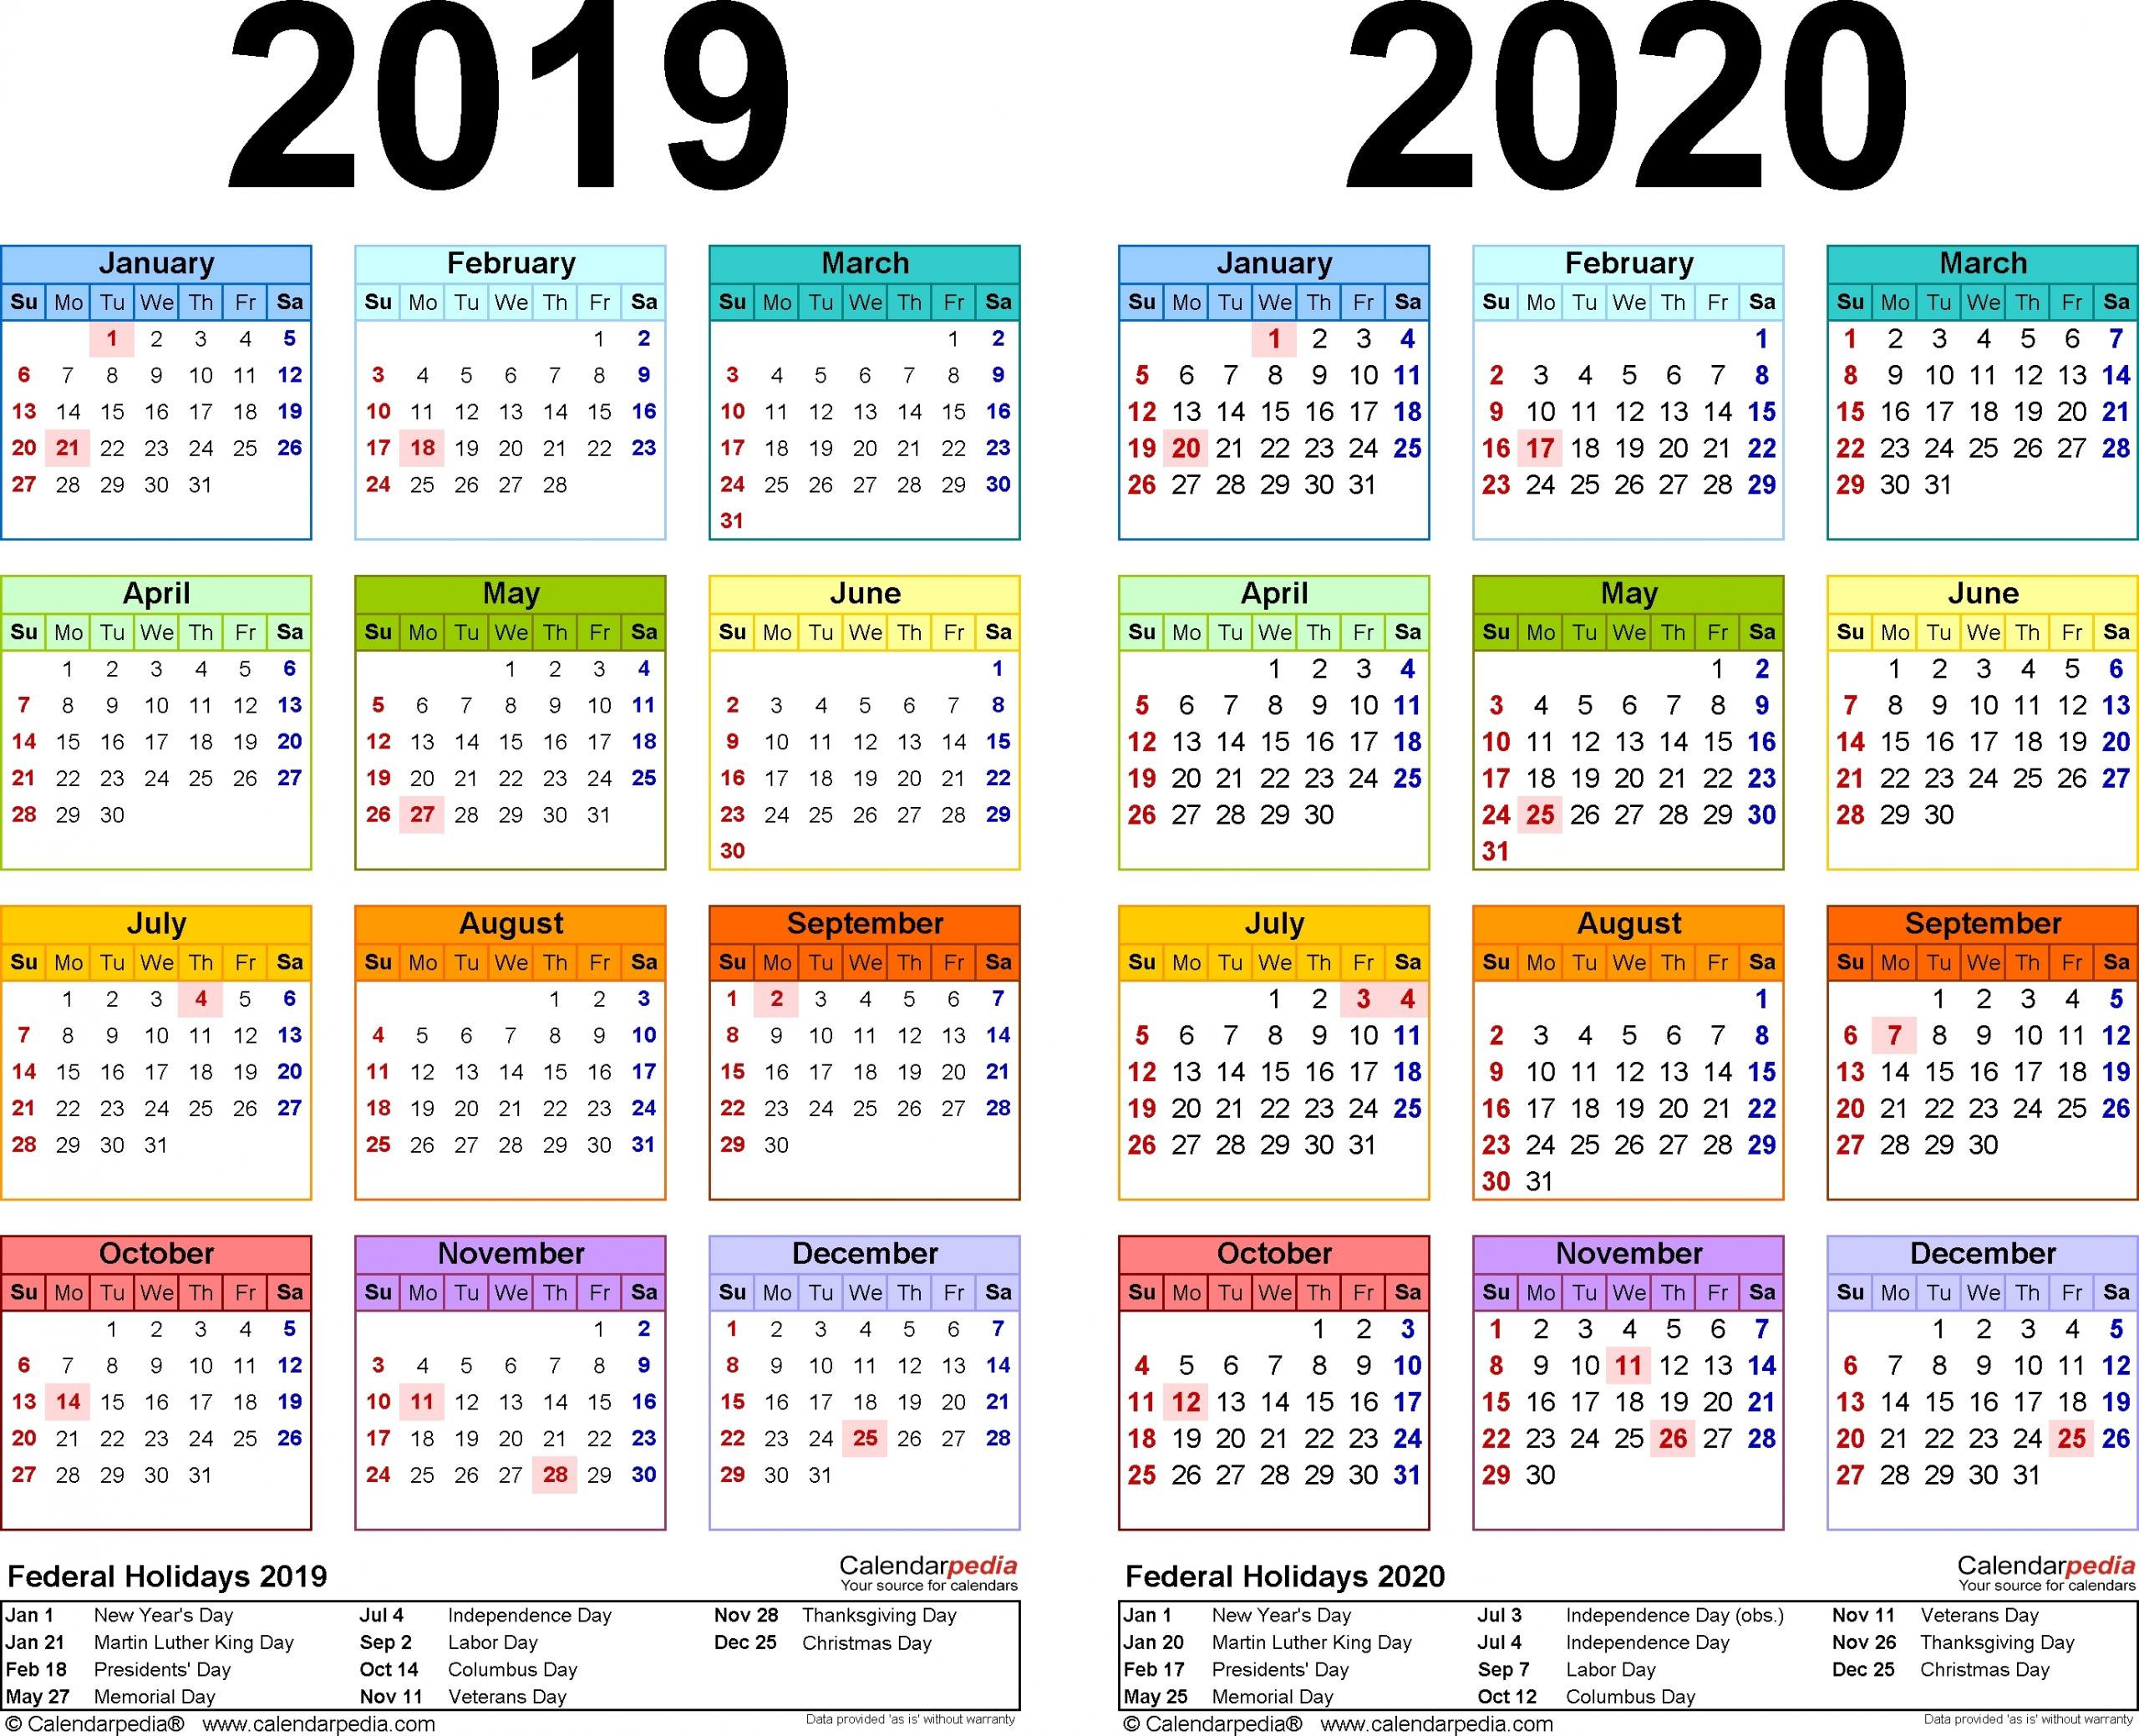 Pick Depo Provera Perpetual Calendar August